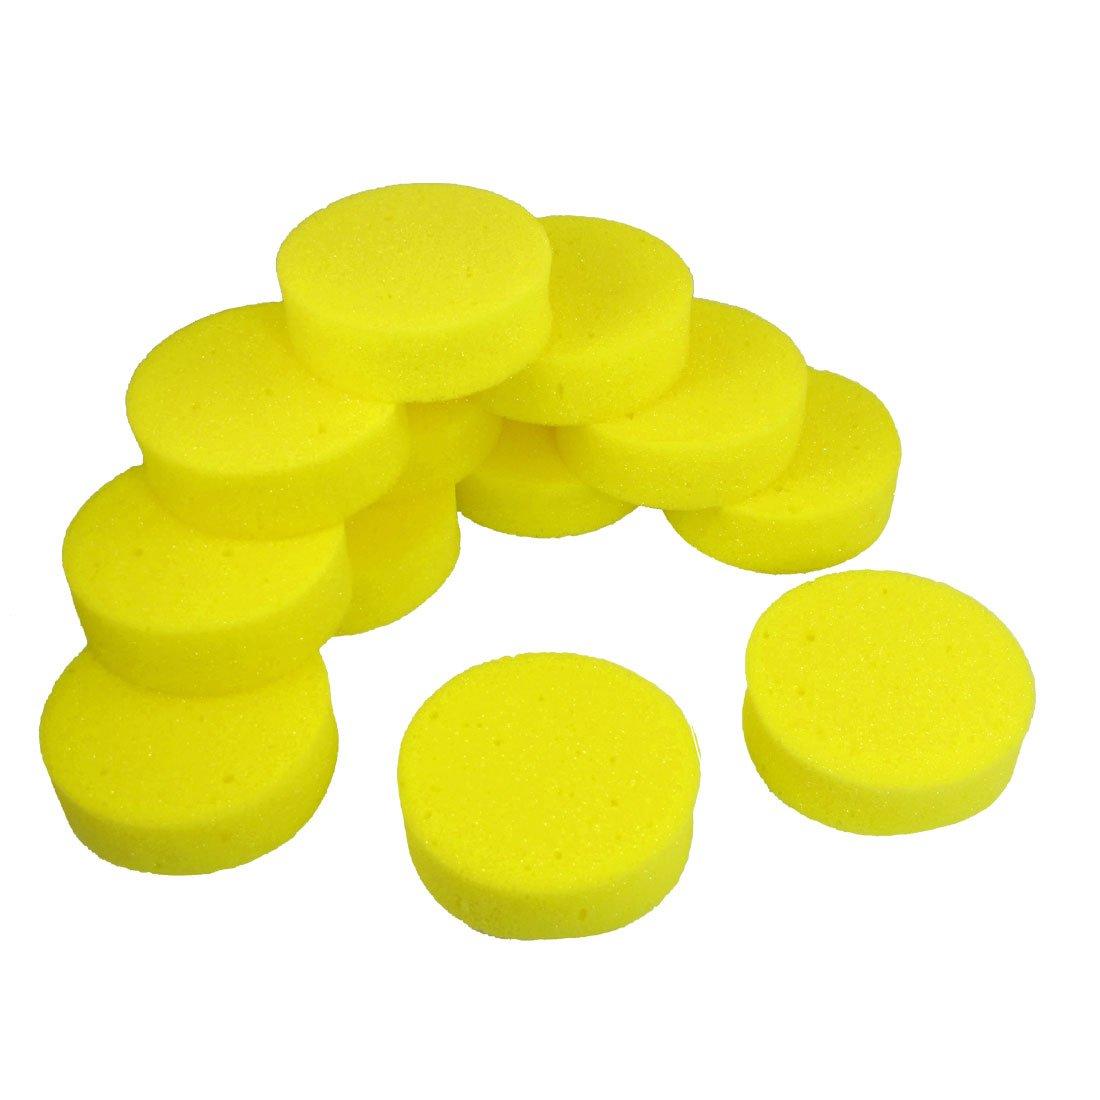 12 Pcs 3.9 Dia Yellow Round Car Wash Cleaning Polishing Sponge Pad